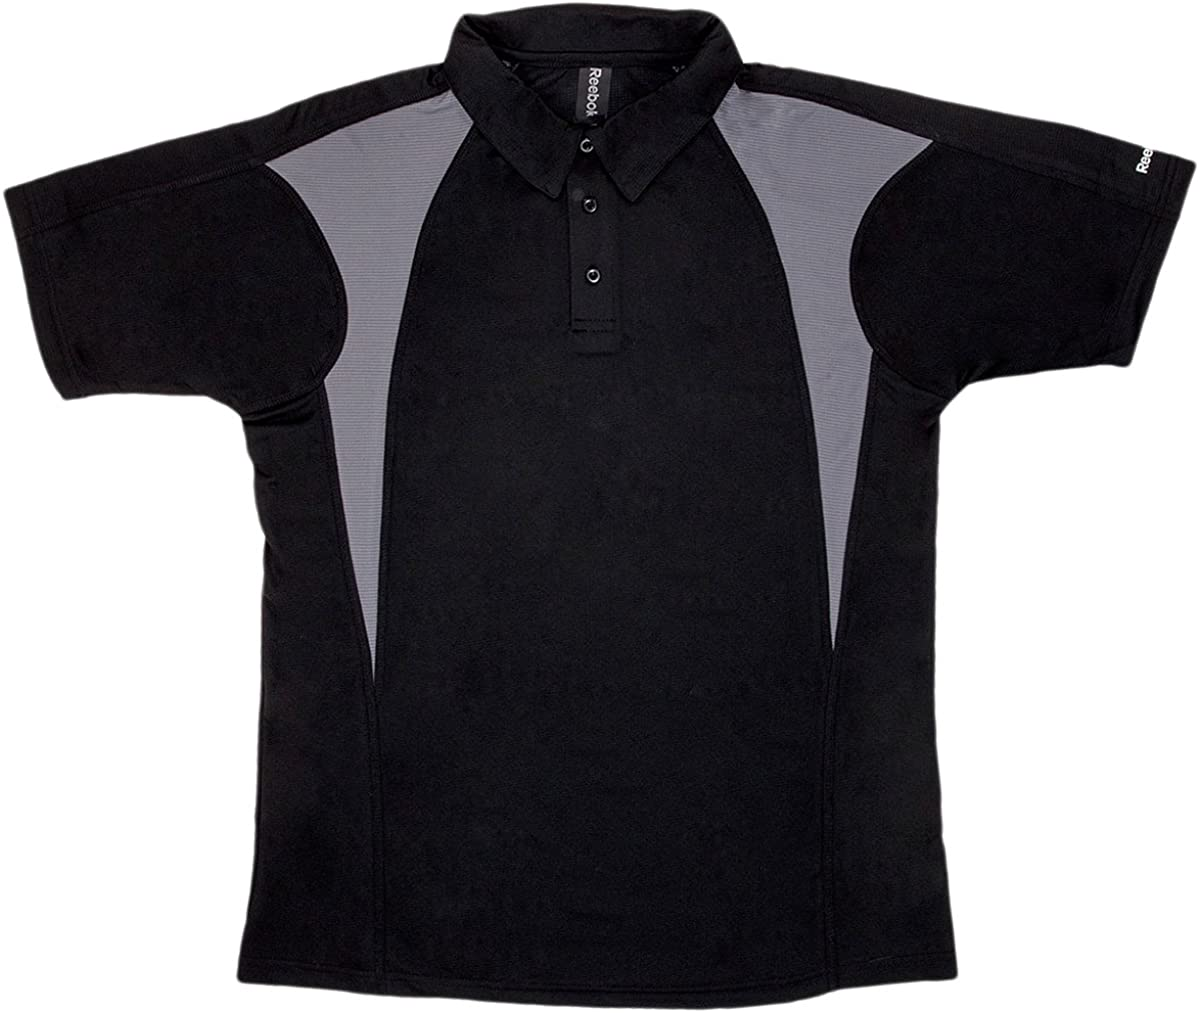 Reebok Men's Playdry Prism Performance Polo, Black/Graphite, Large